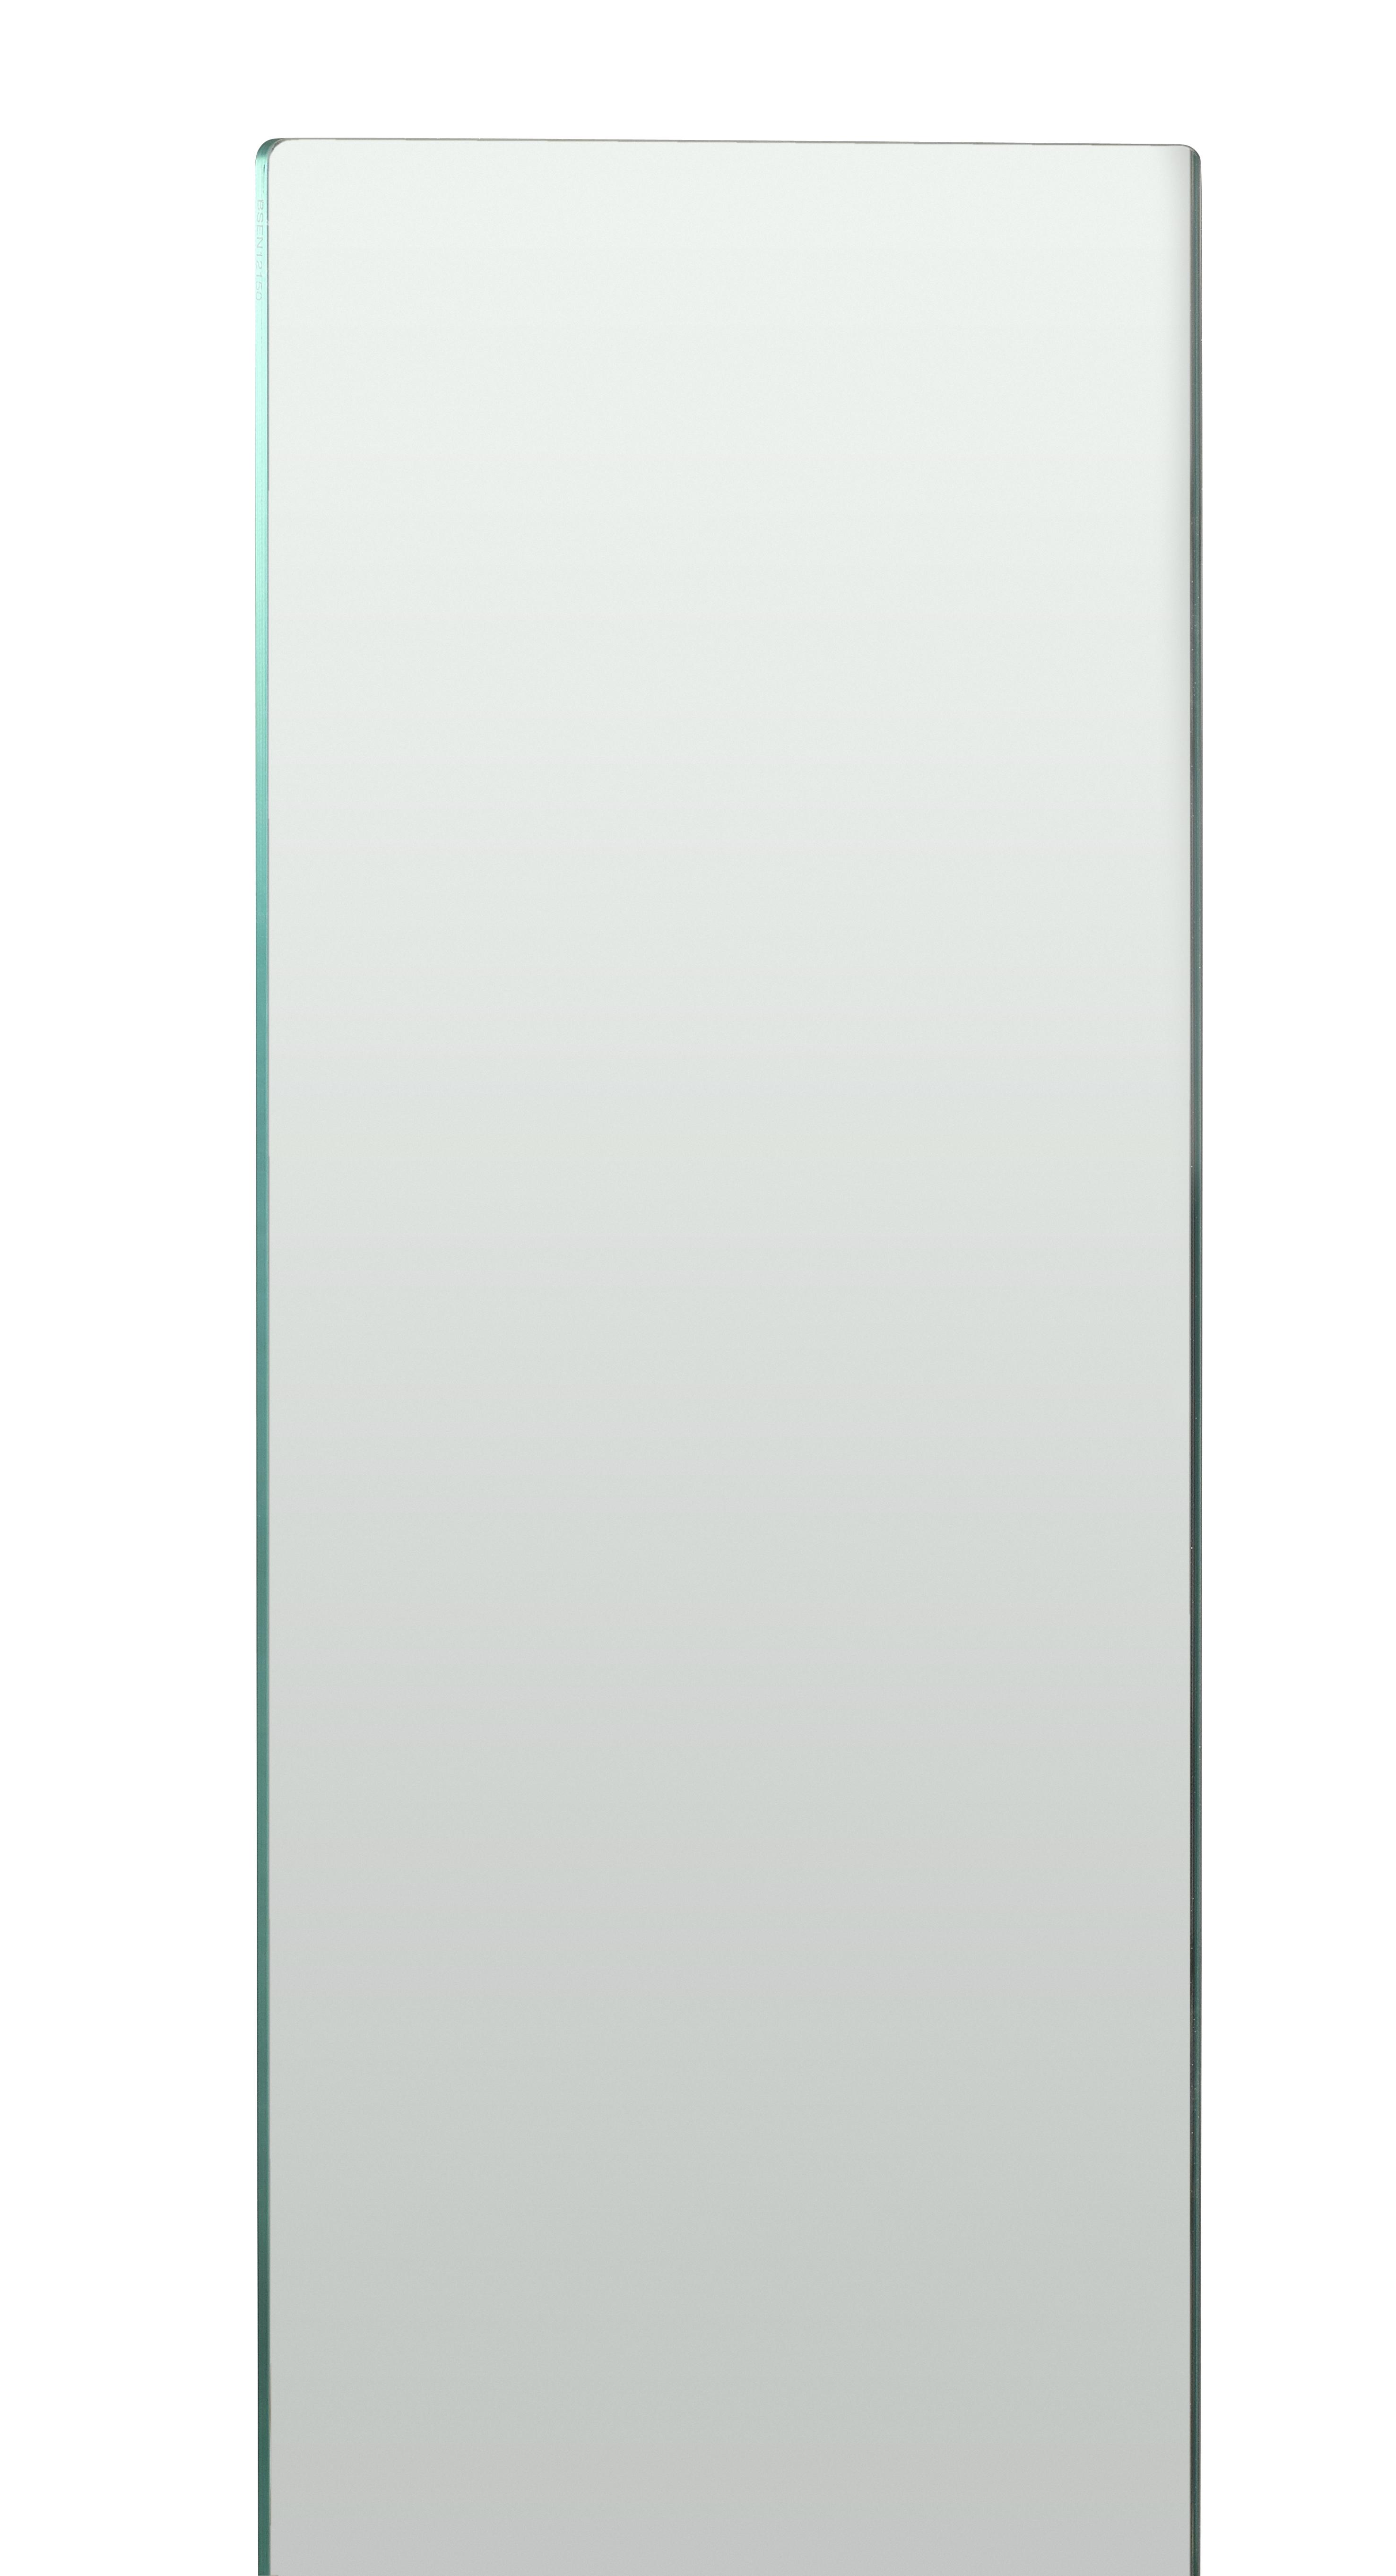 1 Immix Landing Glass Panel